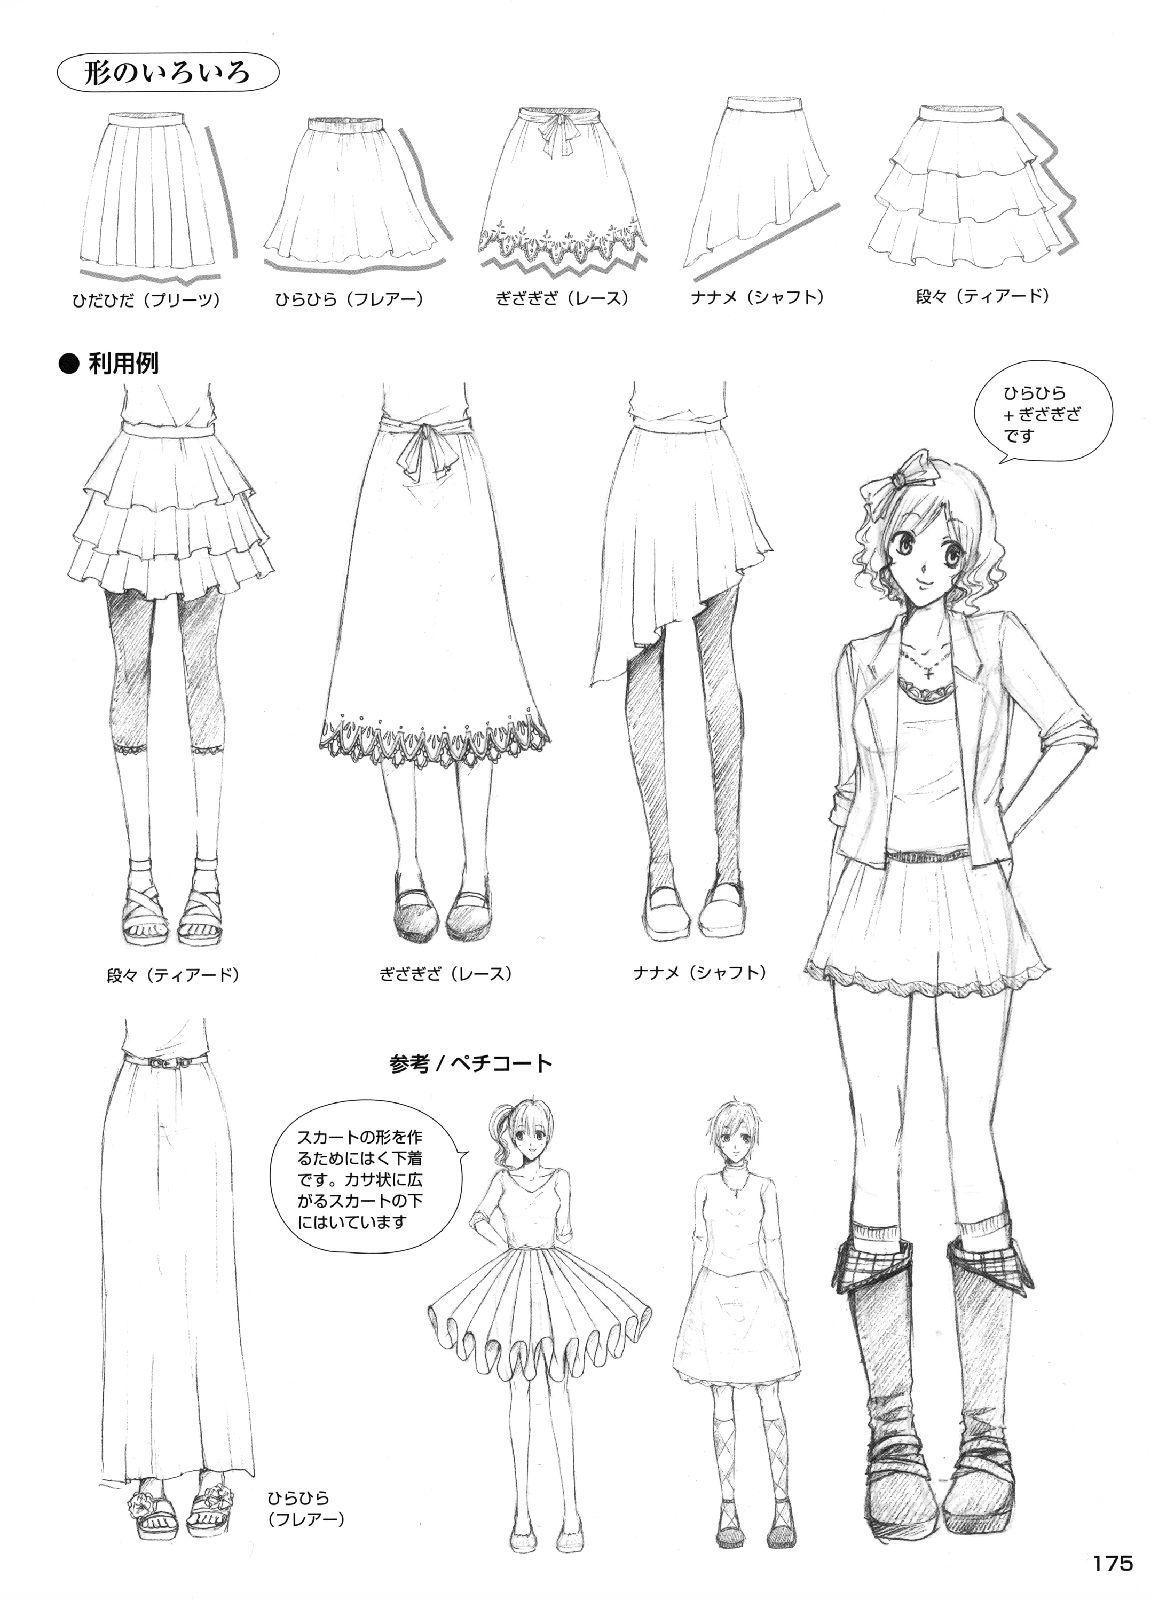 skirt drawing references Drawings, Manga clothes, Manga